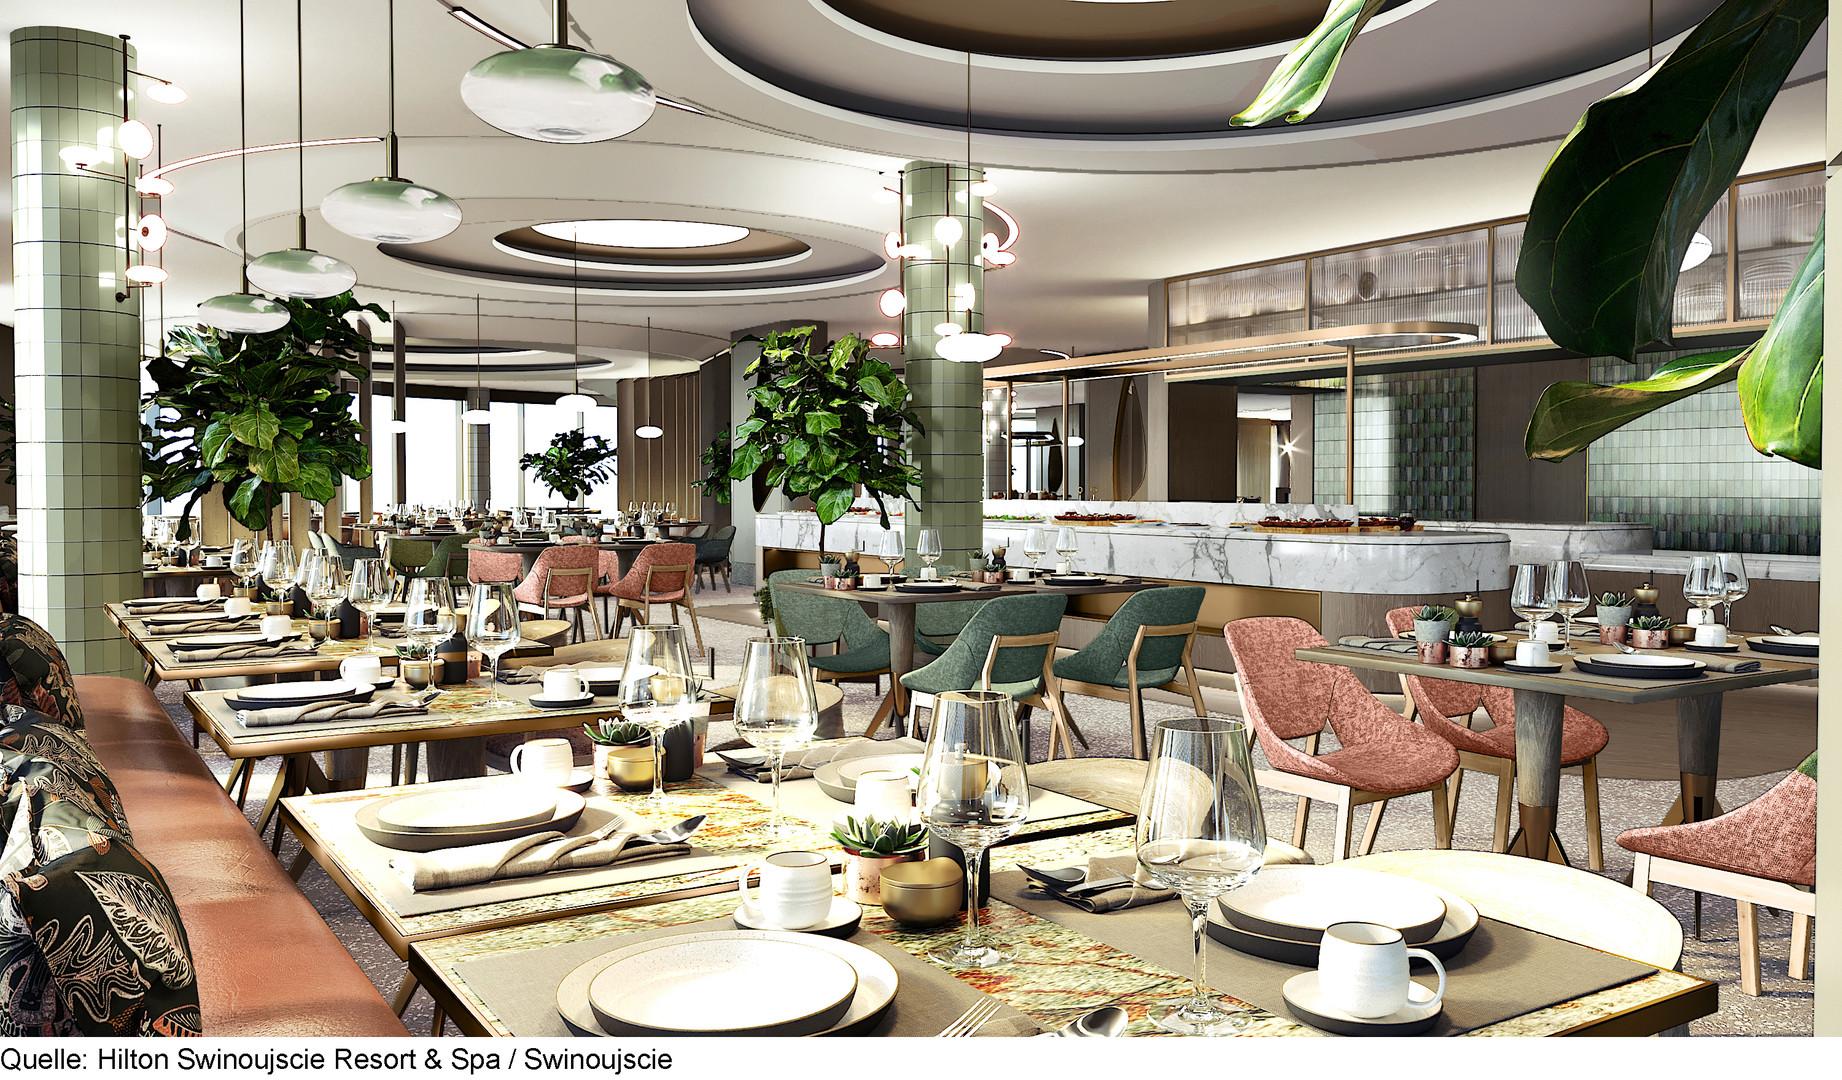 Hilton Swinoujscie Resort & Spa #2